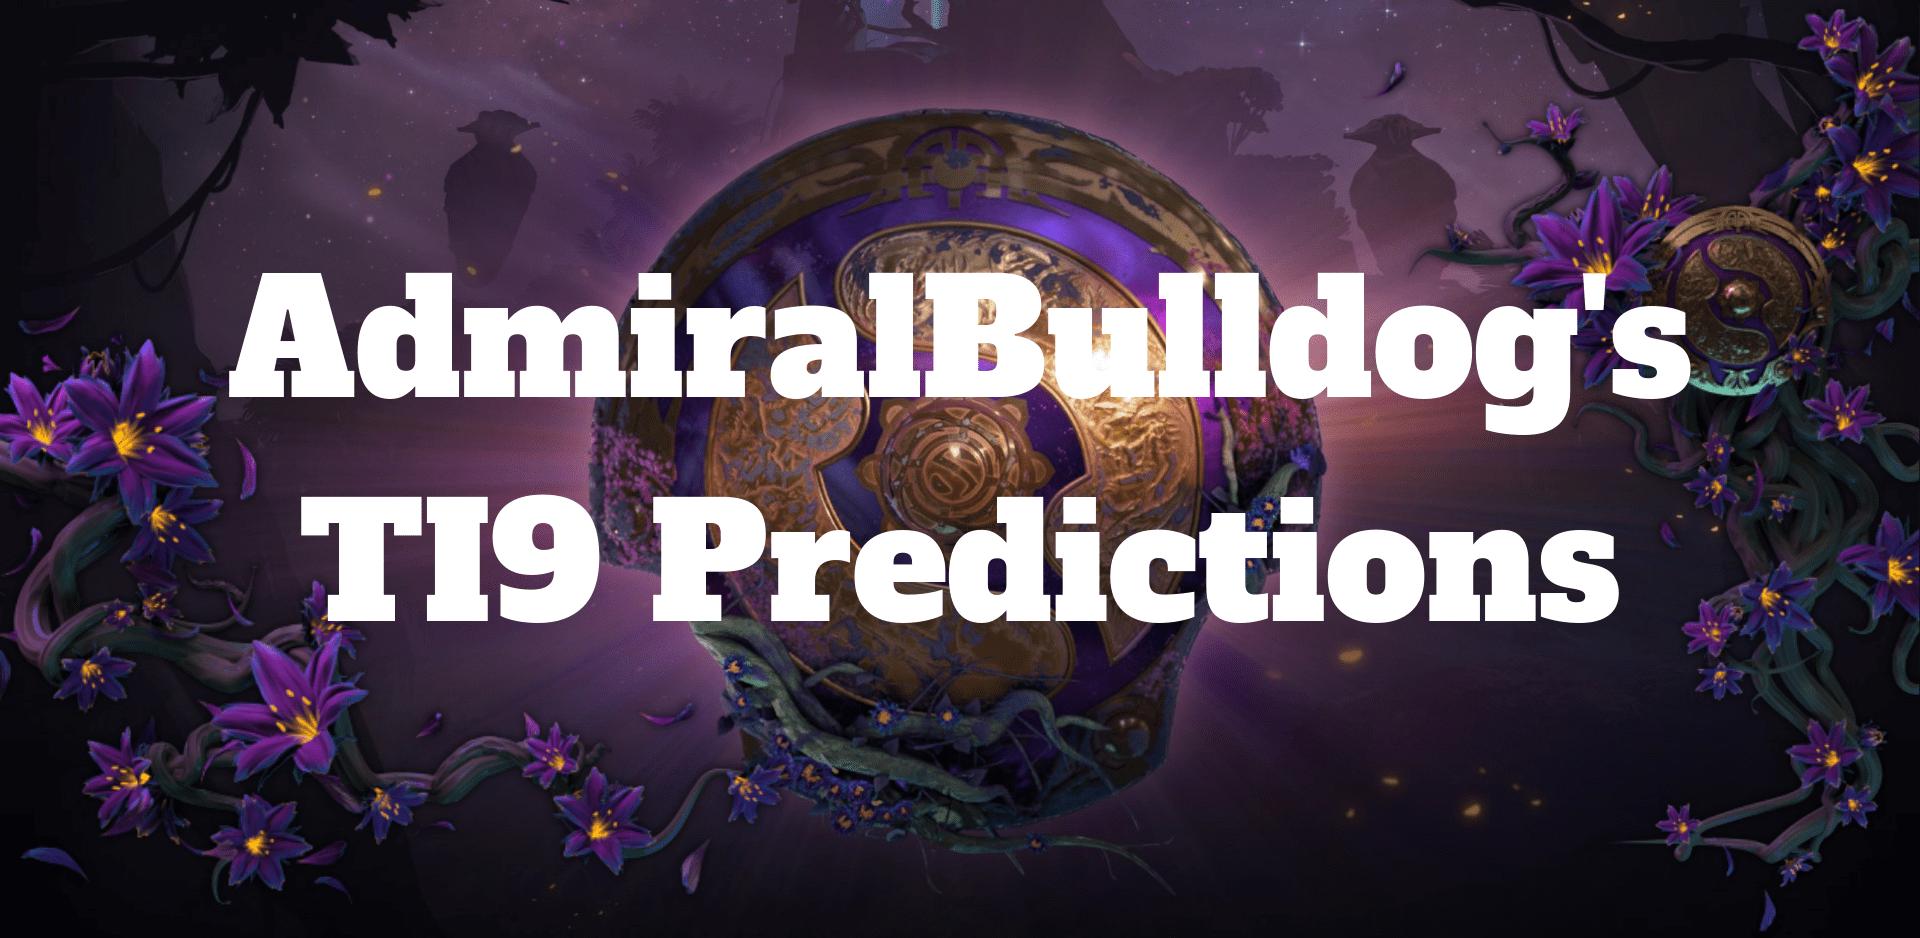 The International 2019 predictions by AdmiralBulldog